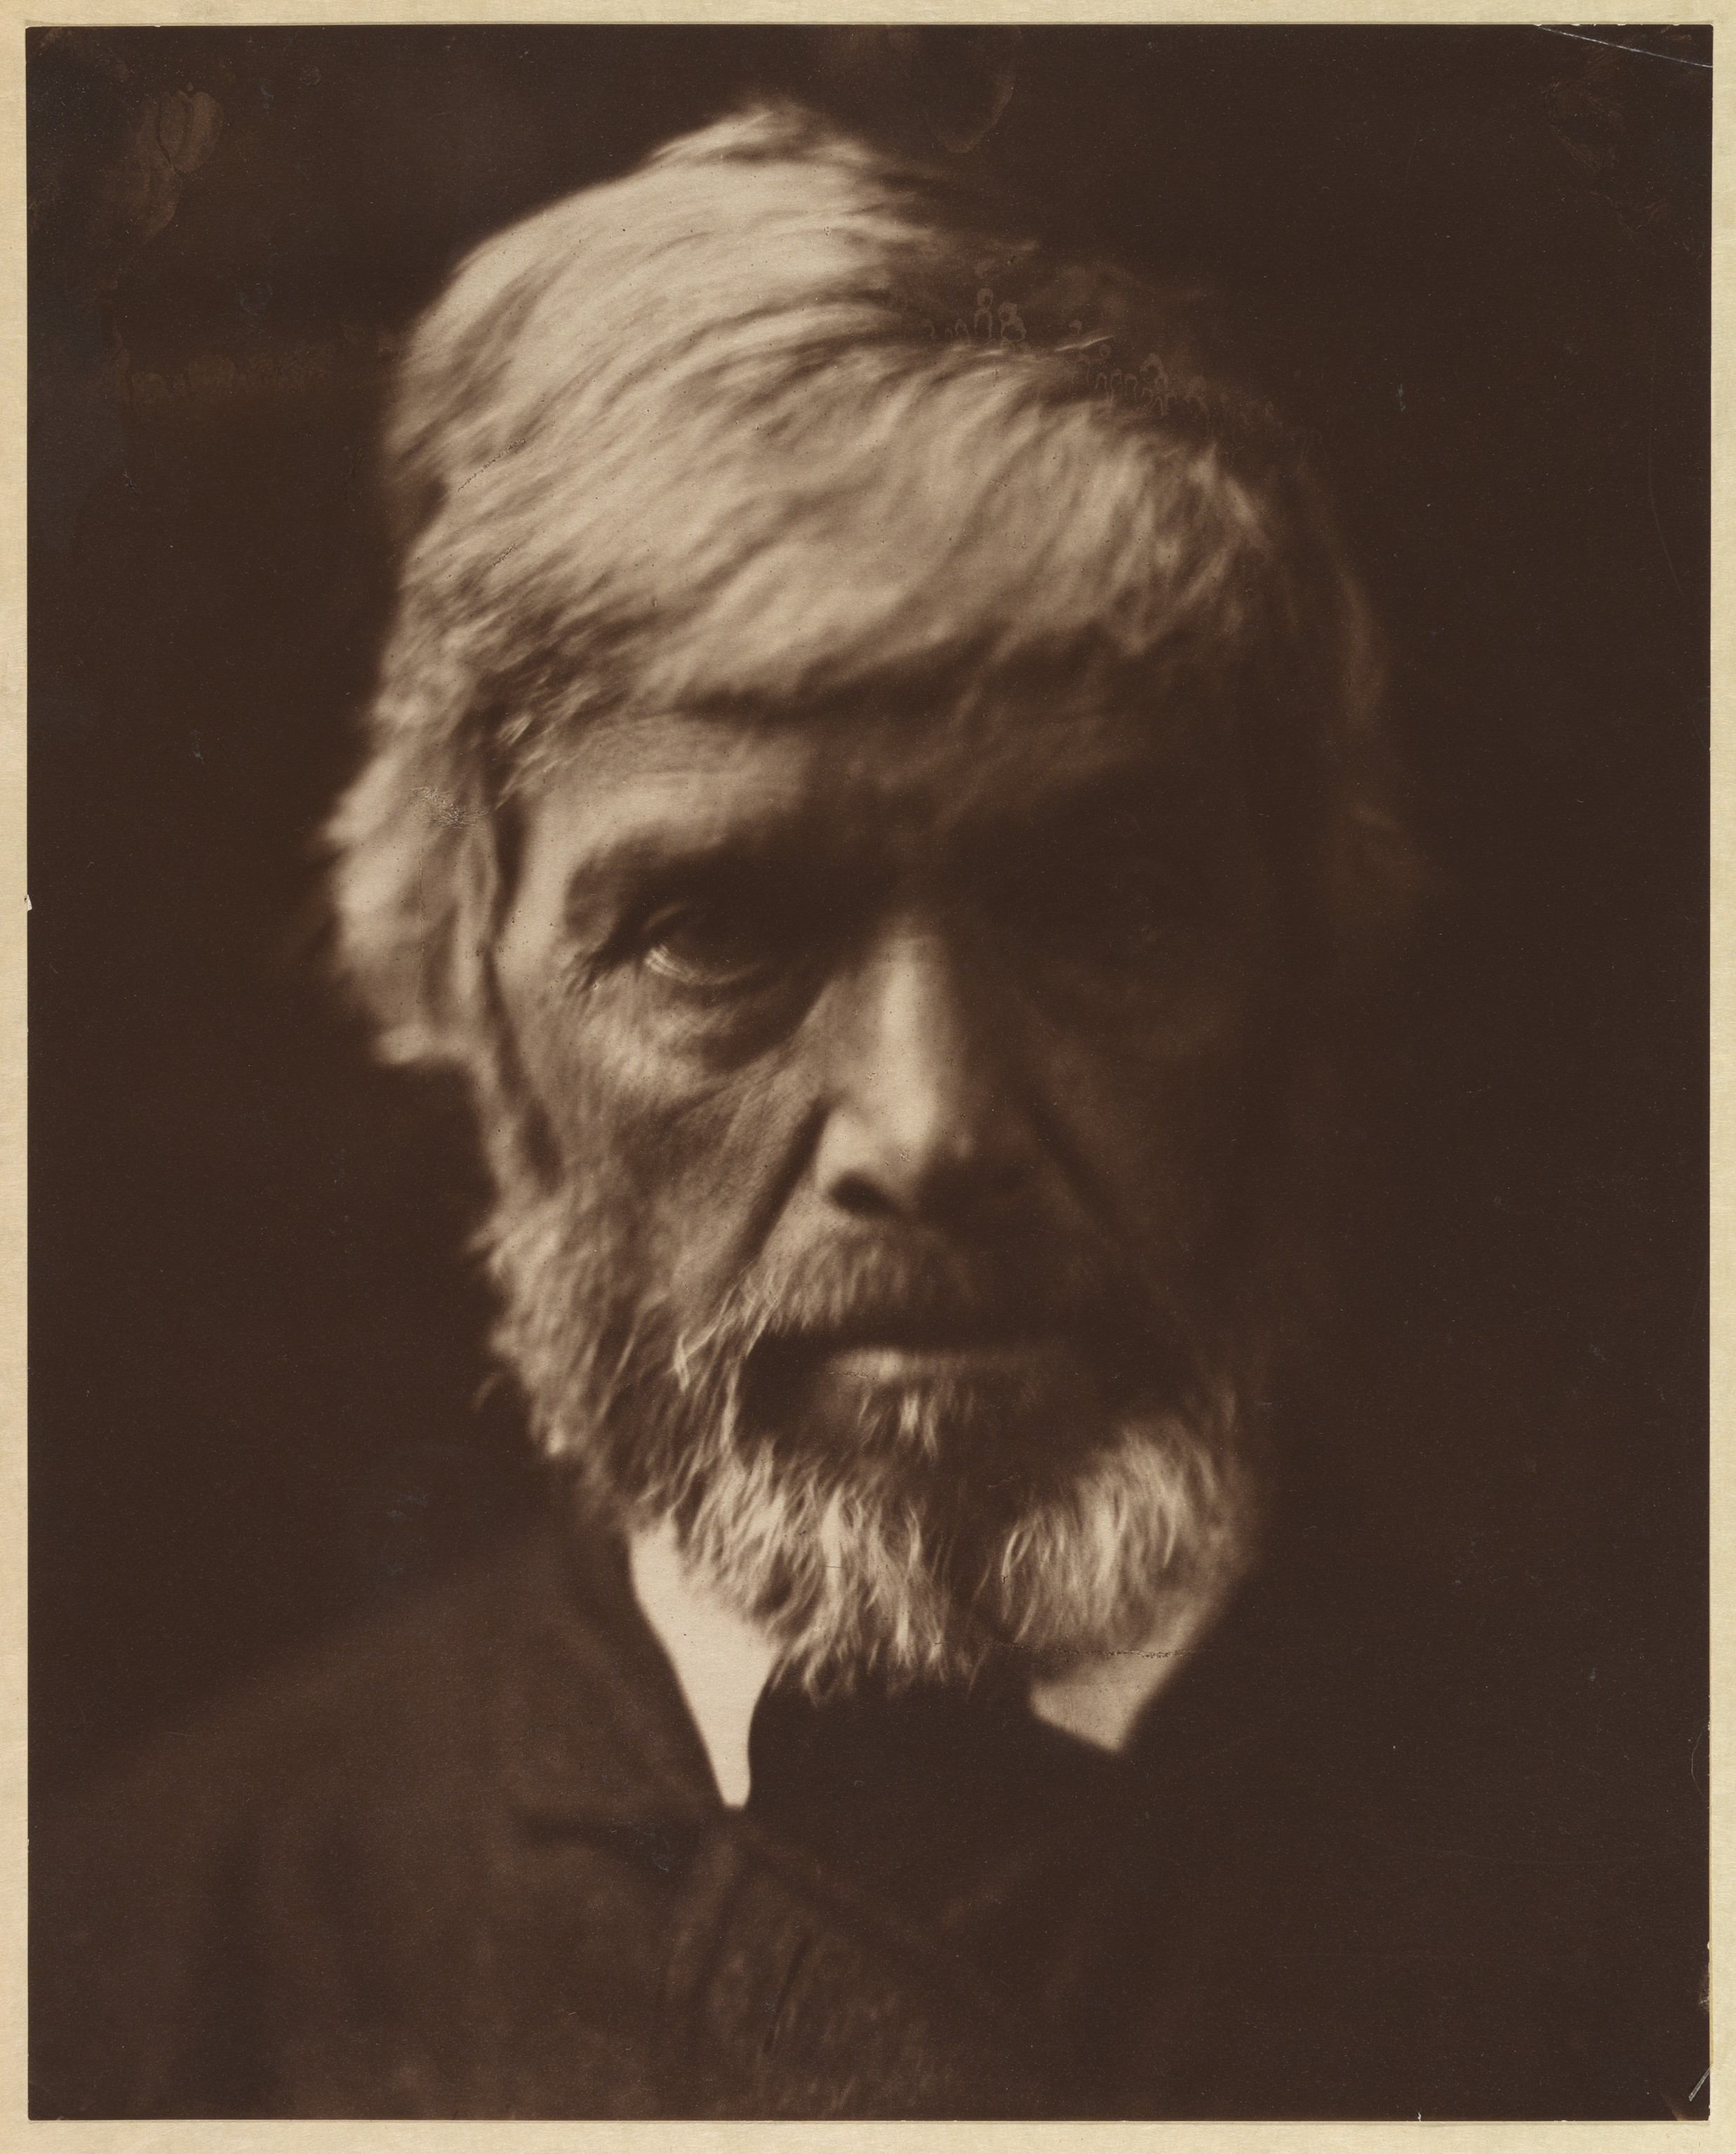 Poet Thomas Carlyle